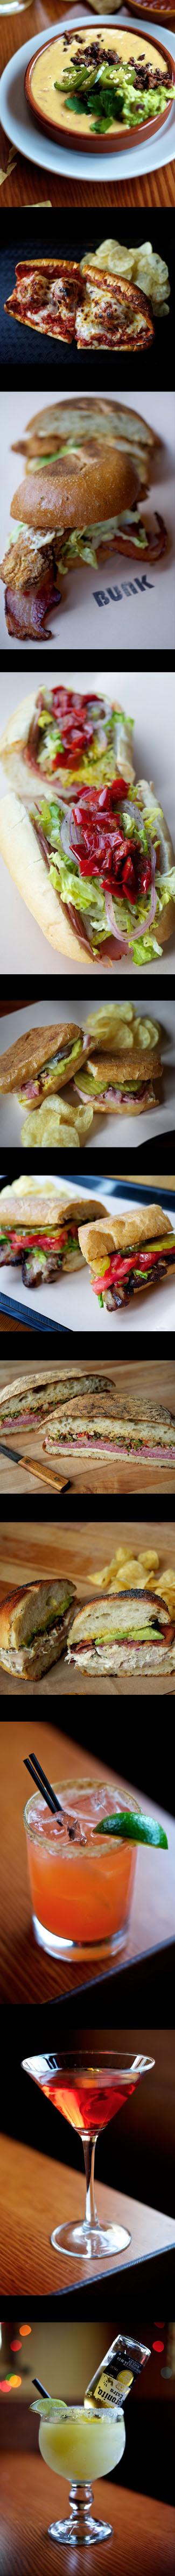 bunksandwiches